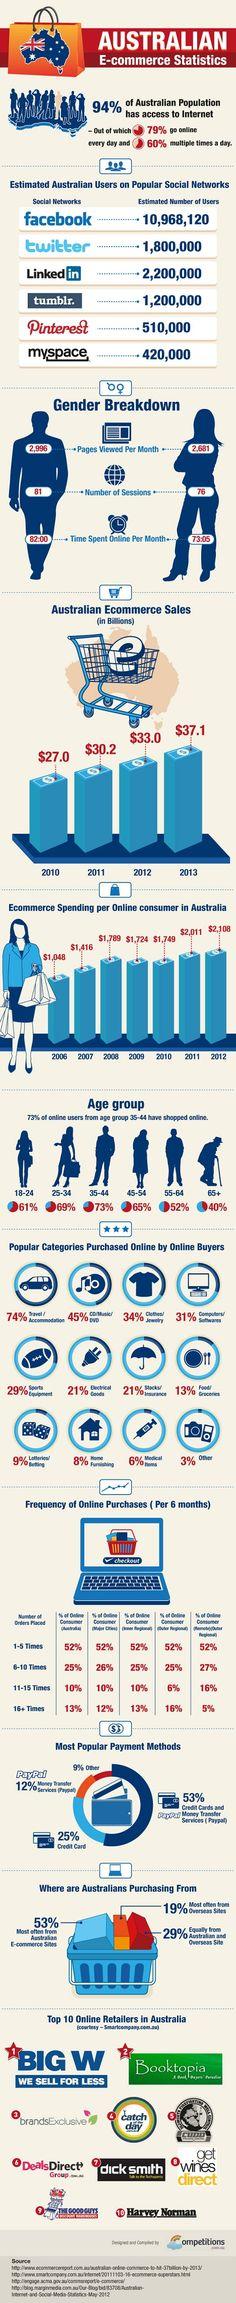 Infographic: Australian-E-Commerce-Statistics and social media usage.